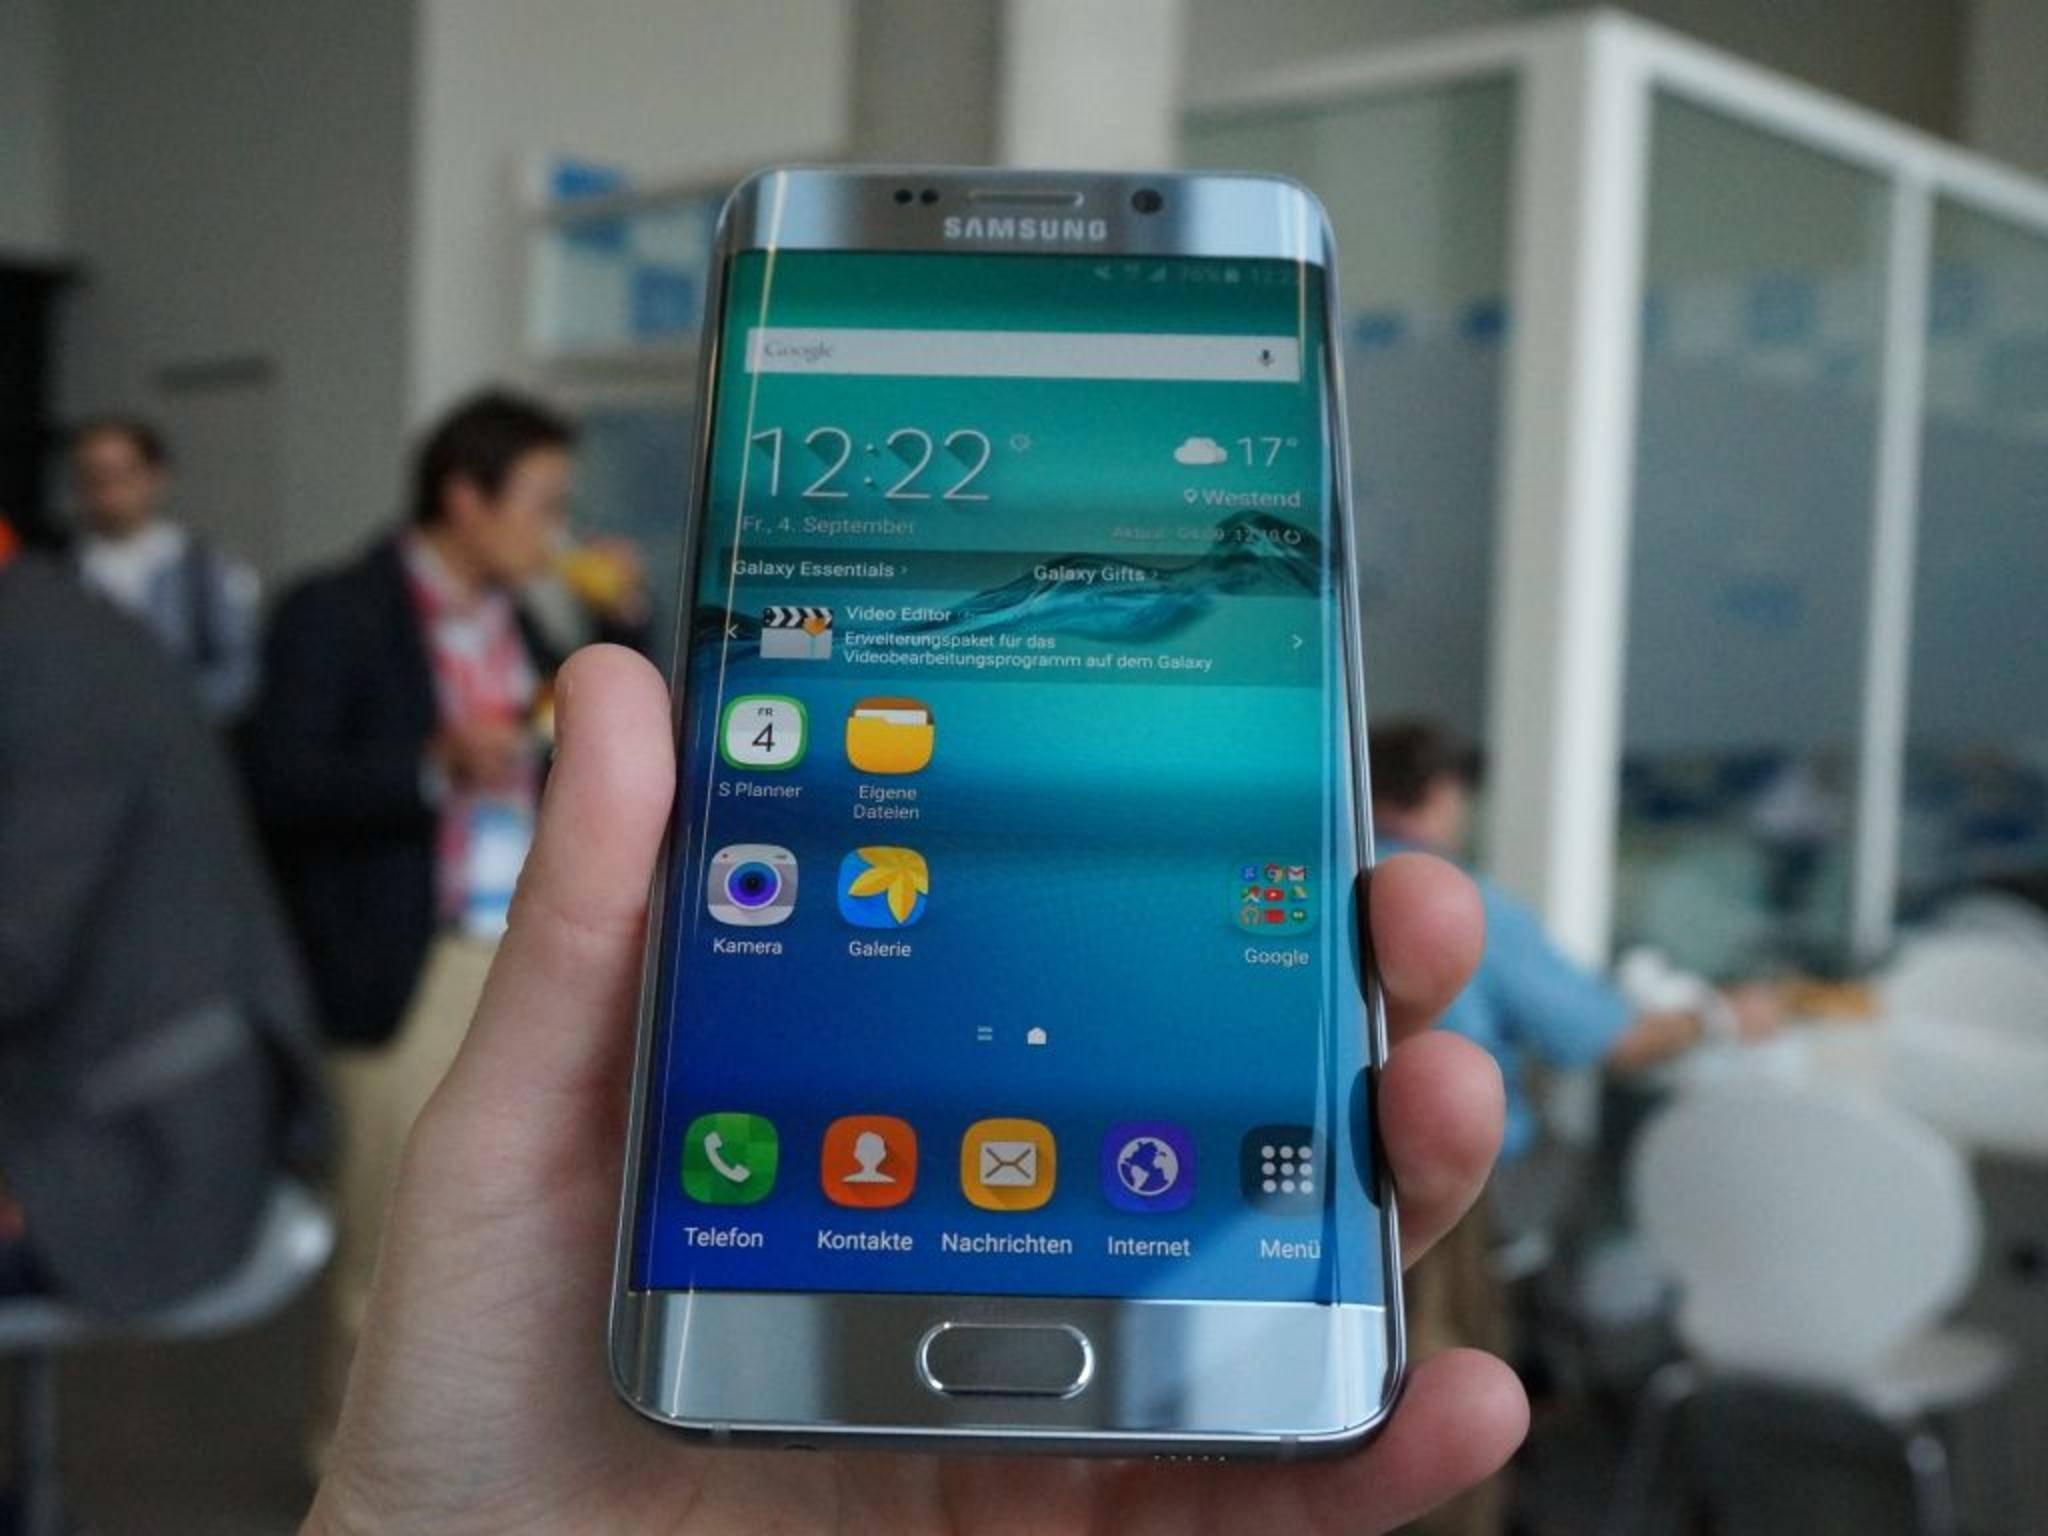 Samsung Galaxy S6 Edge+ 16